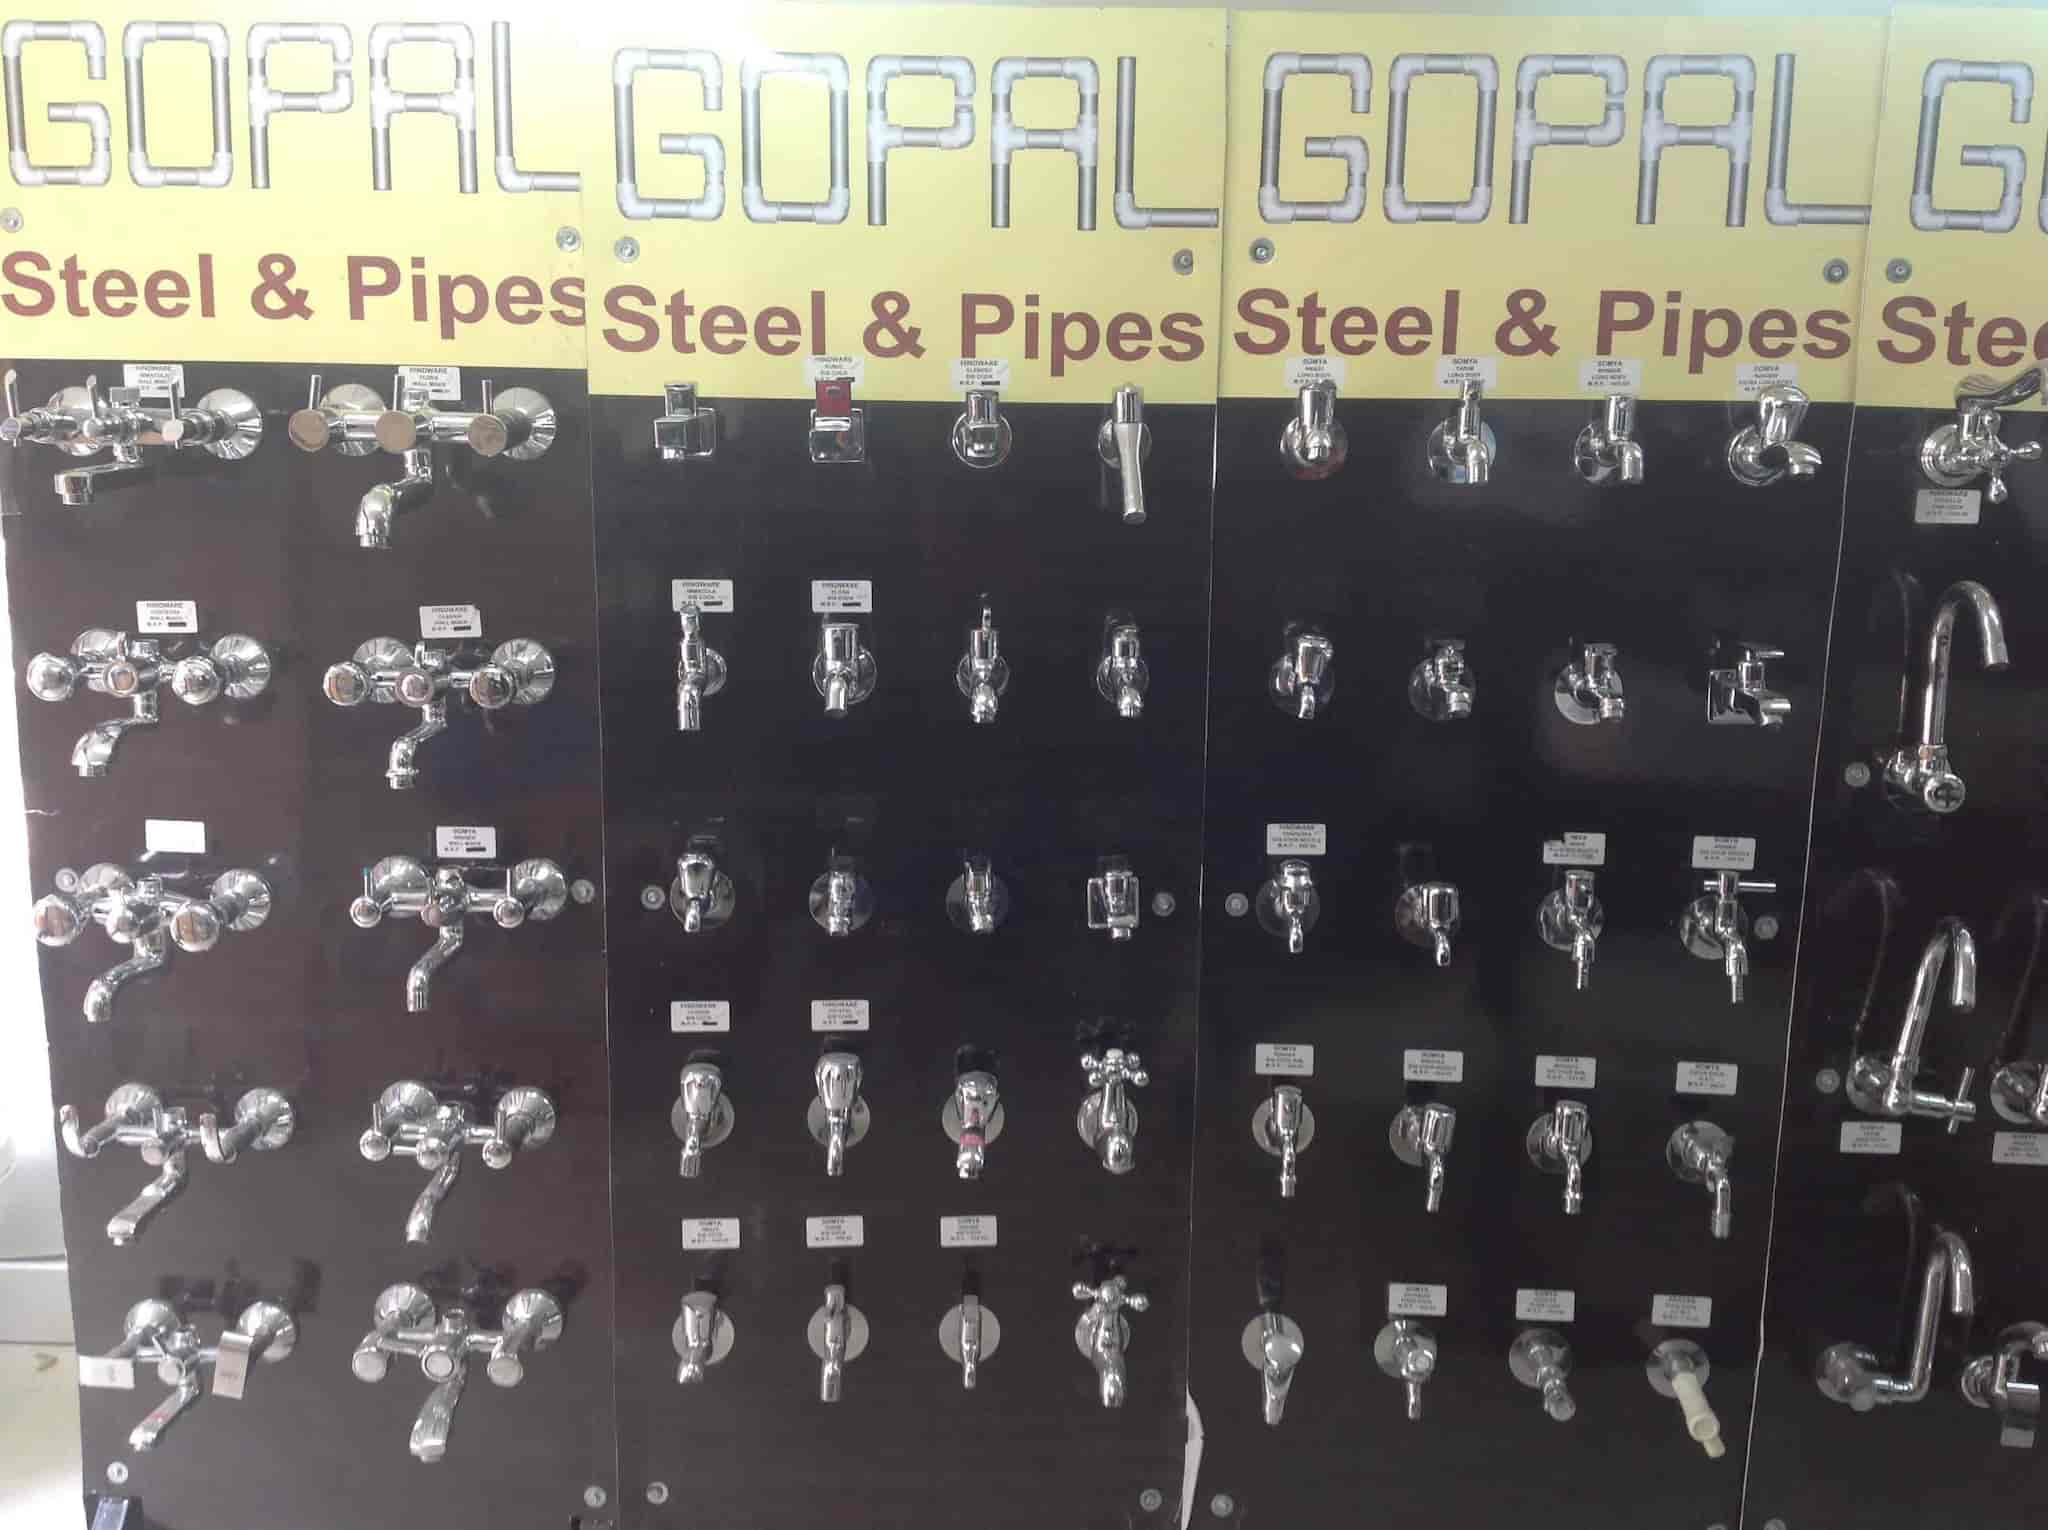 Gopal Steel And Pipes & Gopal Steel And Pipes Jalna Road Aurangabad - Gopal Steel u0026 Pipes ...